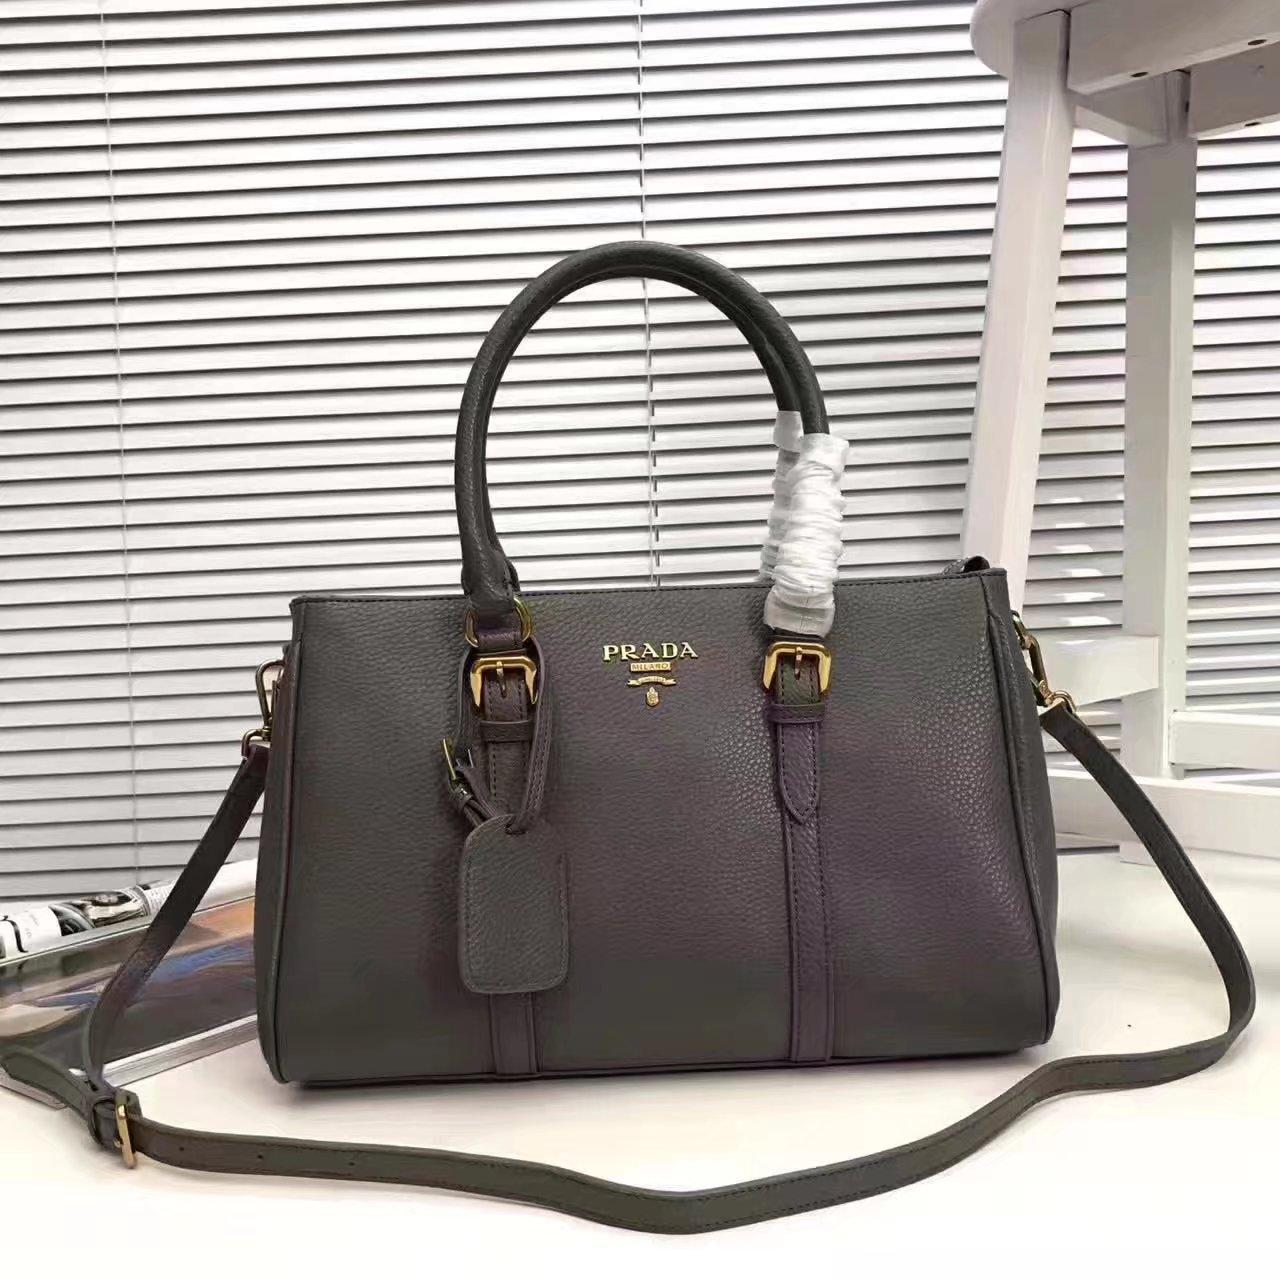 Prada 2996 Women 175 Tote Handbag Grey